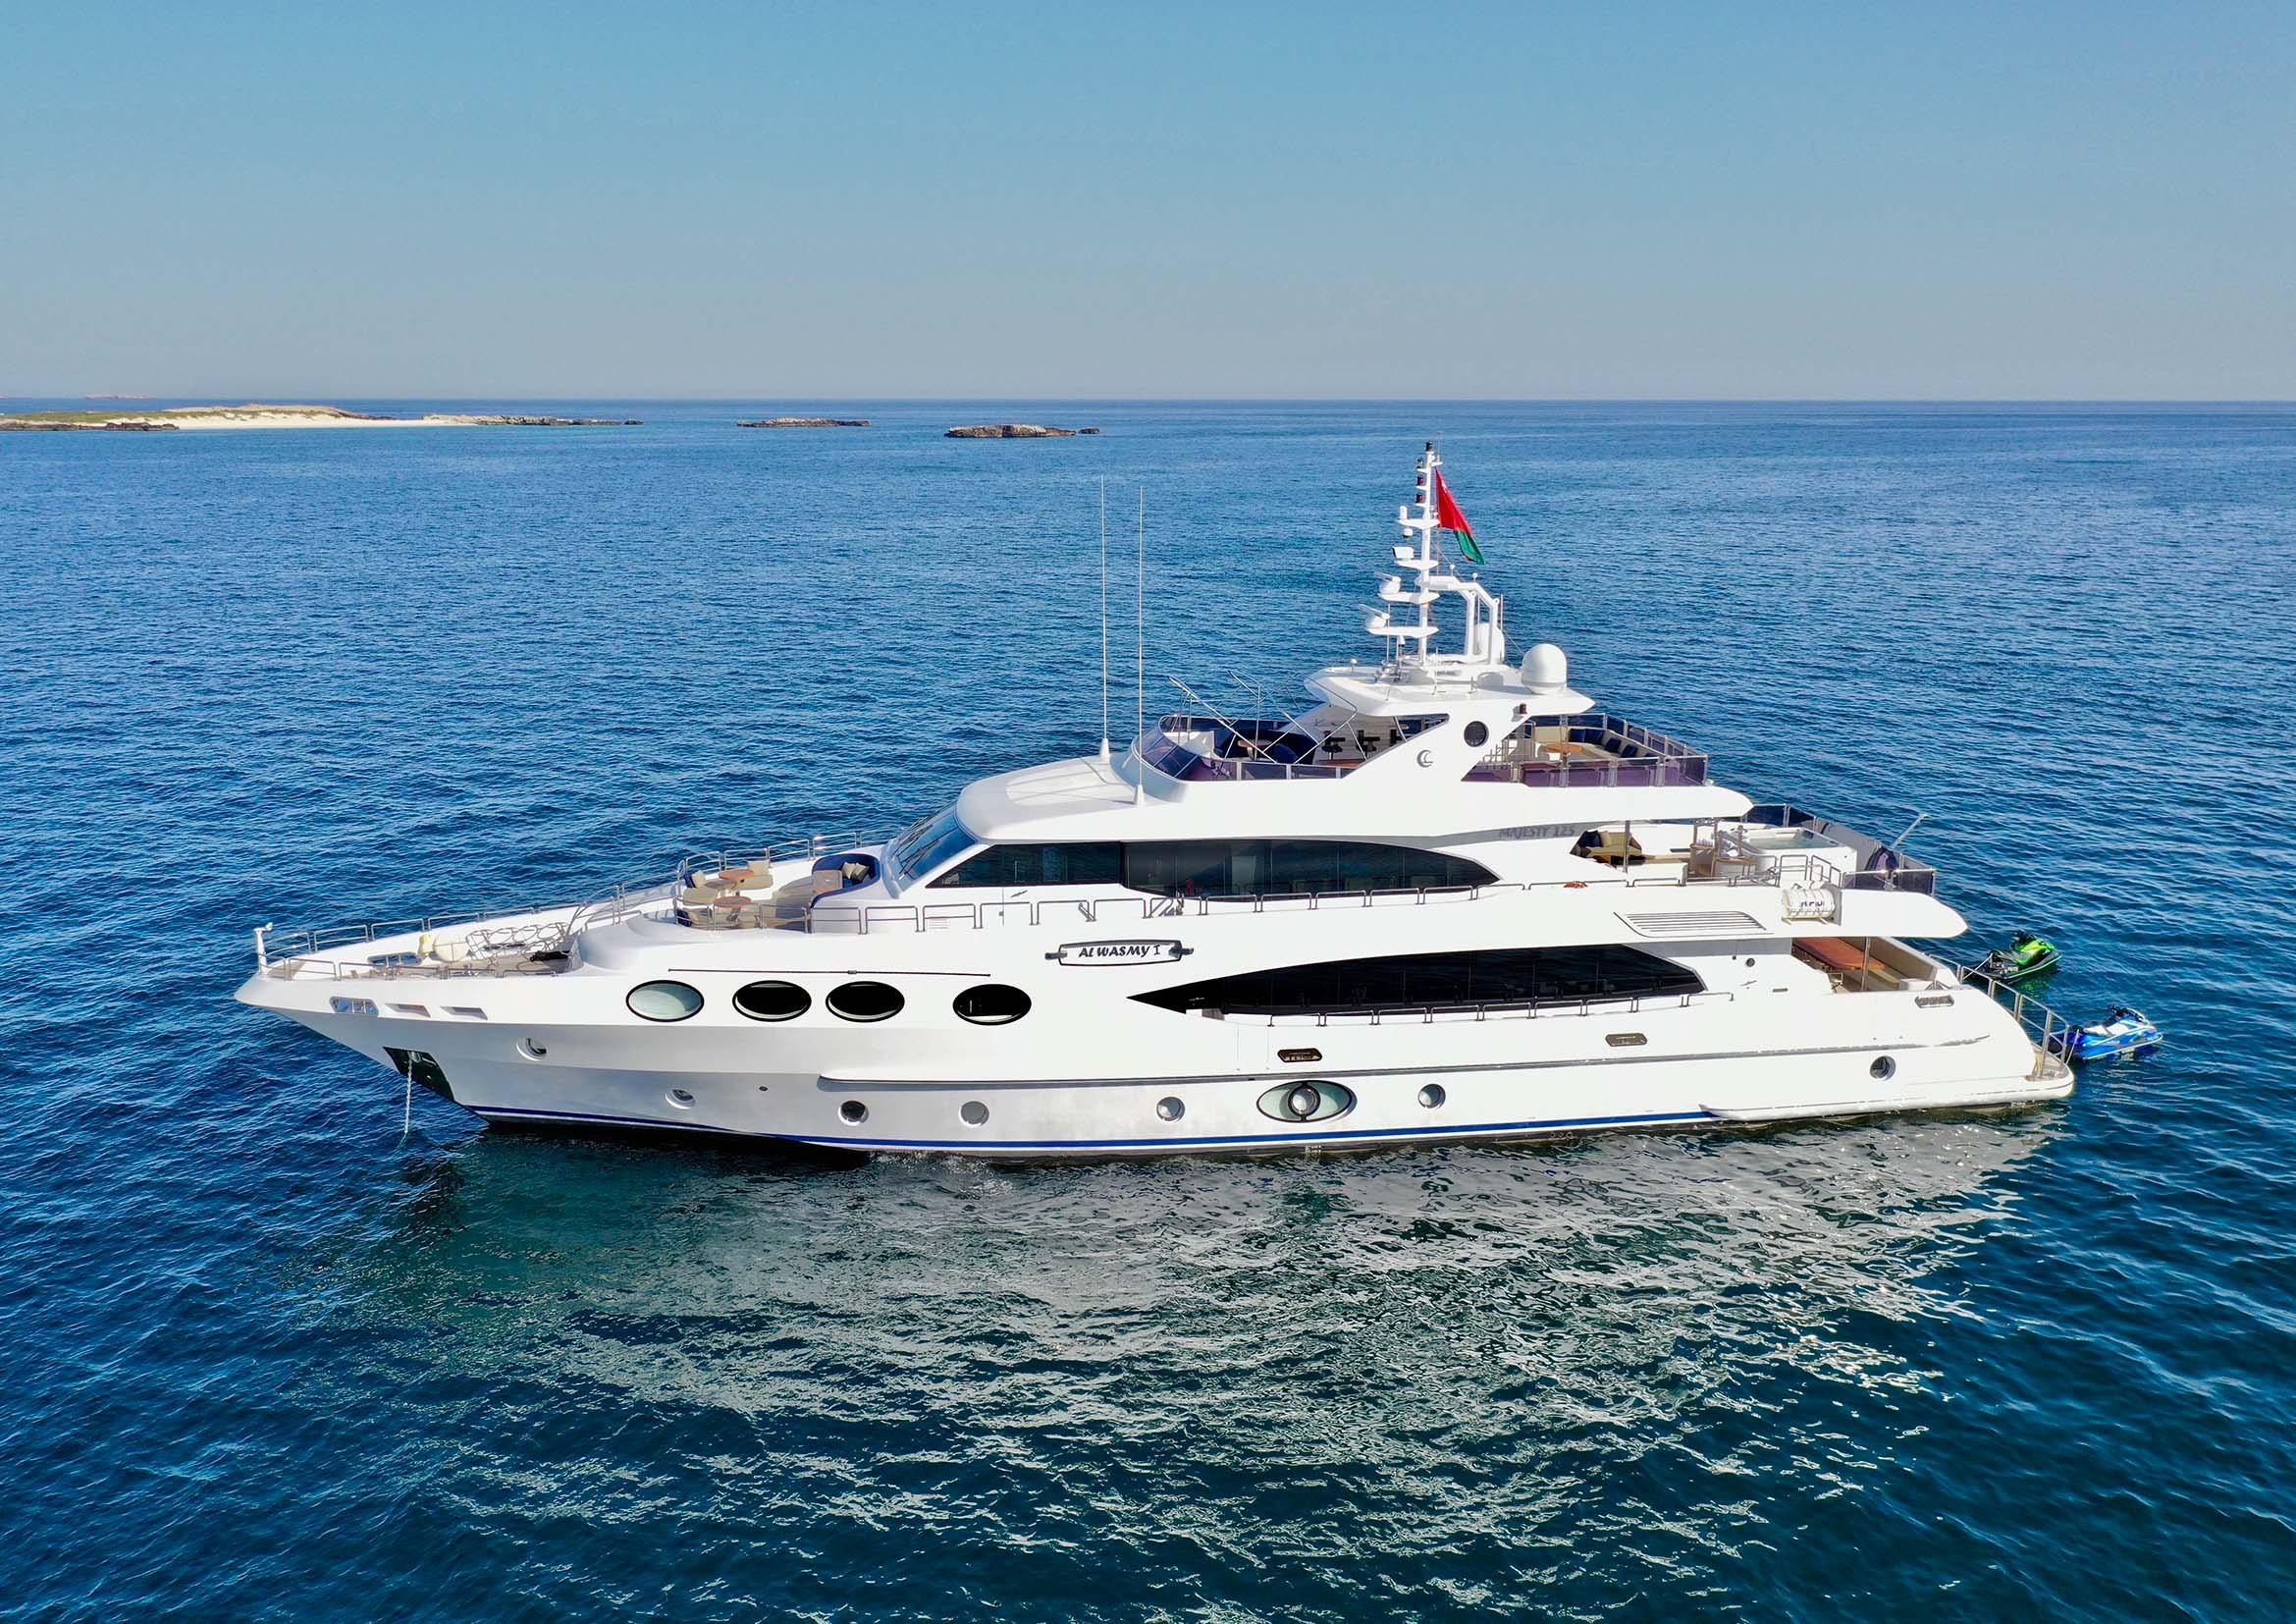 Piastre A Induzione Costi 2012 gulf craft majesty 125, muscat oman - boats